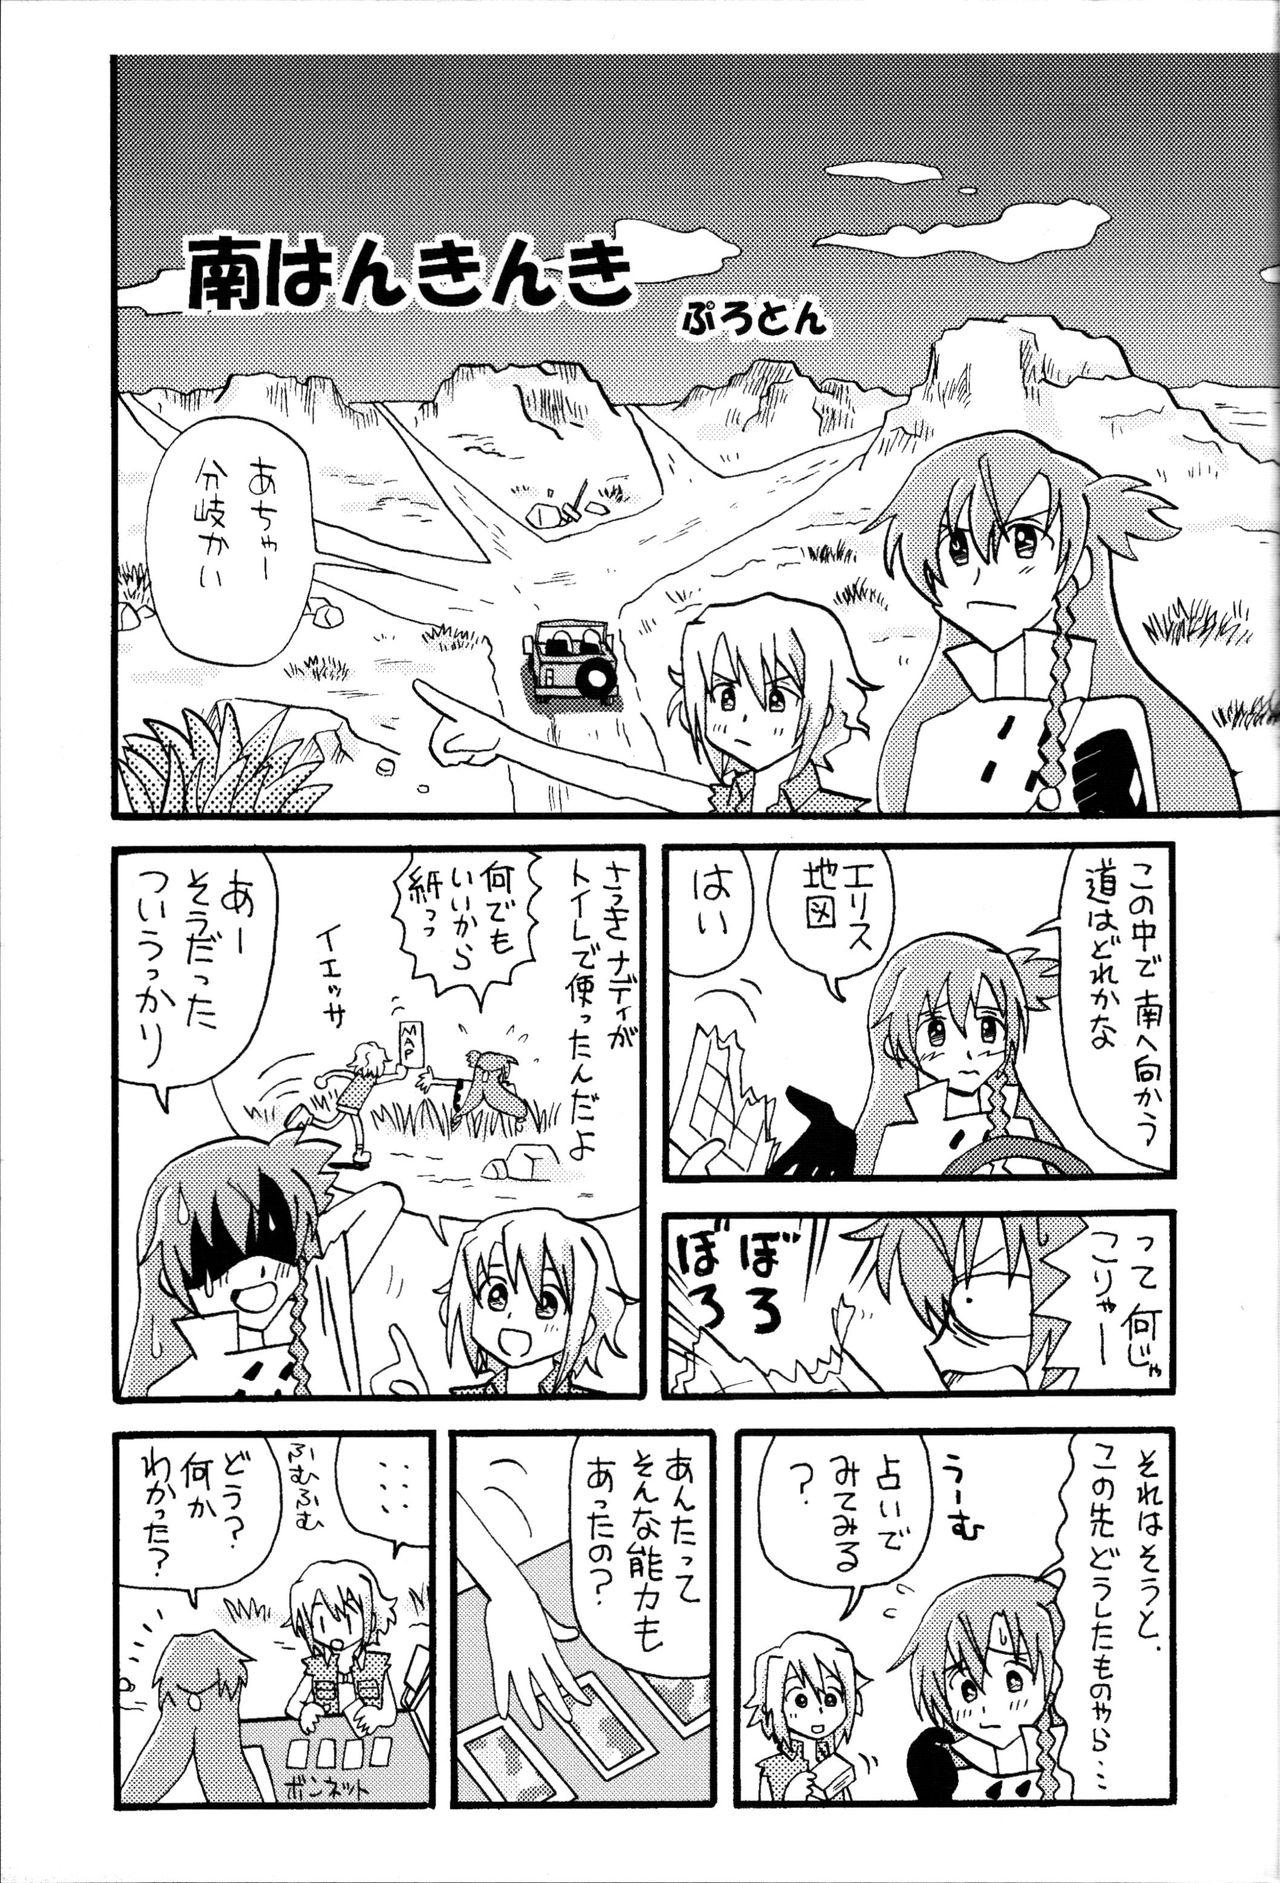 Minamikaze no Yukue 15